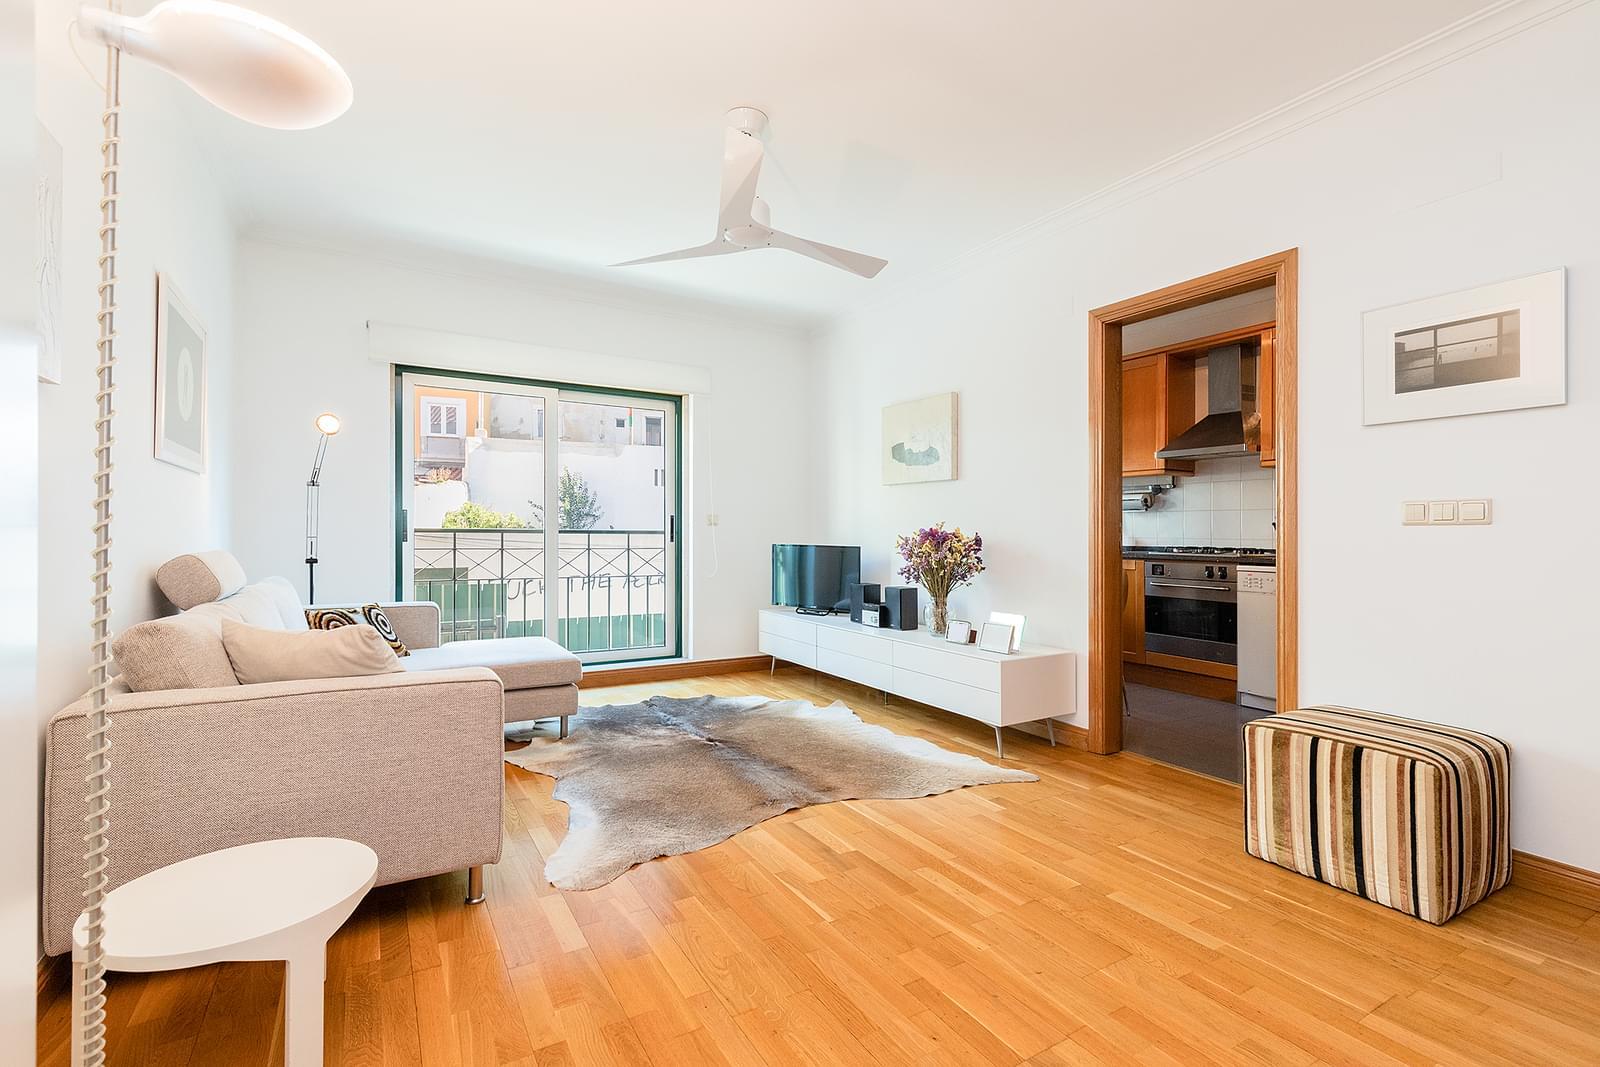 pf18967-apartamento-t2-lisboa-7c56337e-4bd1-4051-97dd-32f3b89e5d25